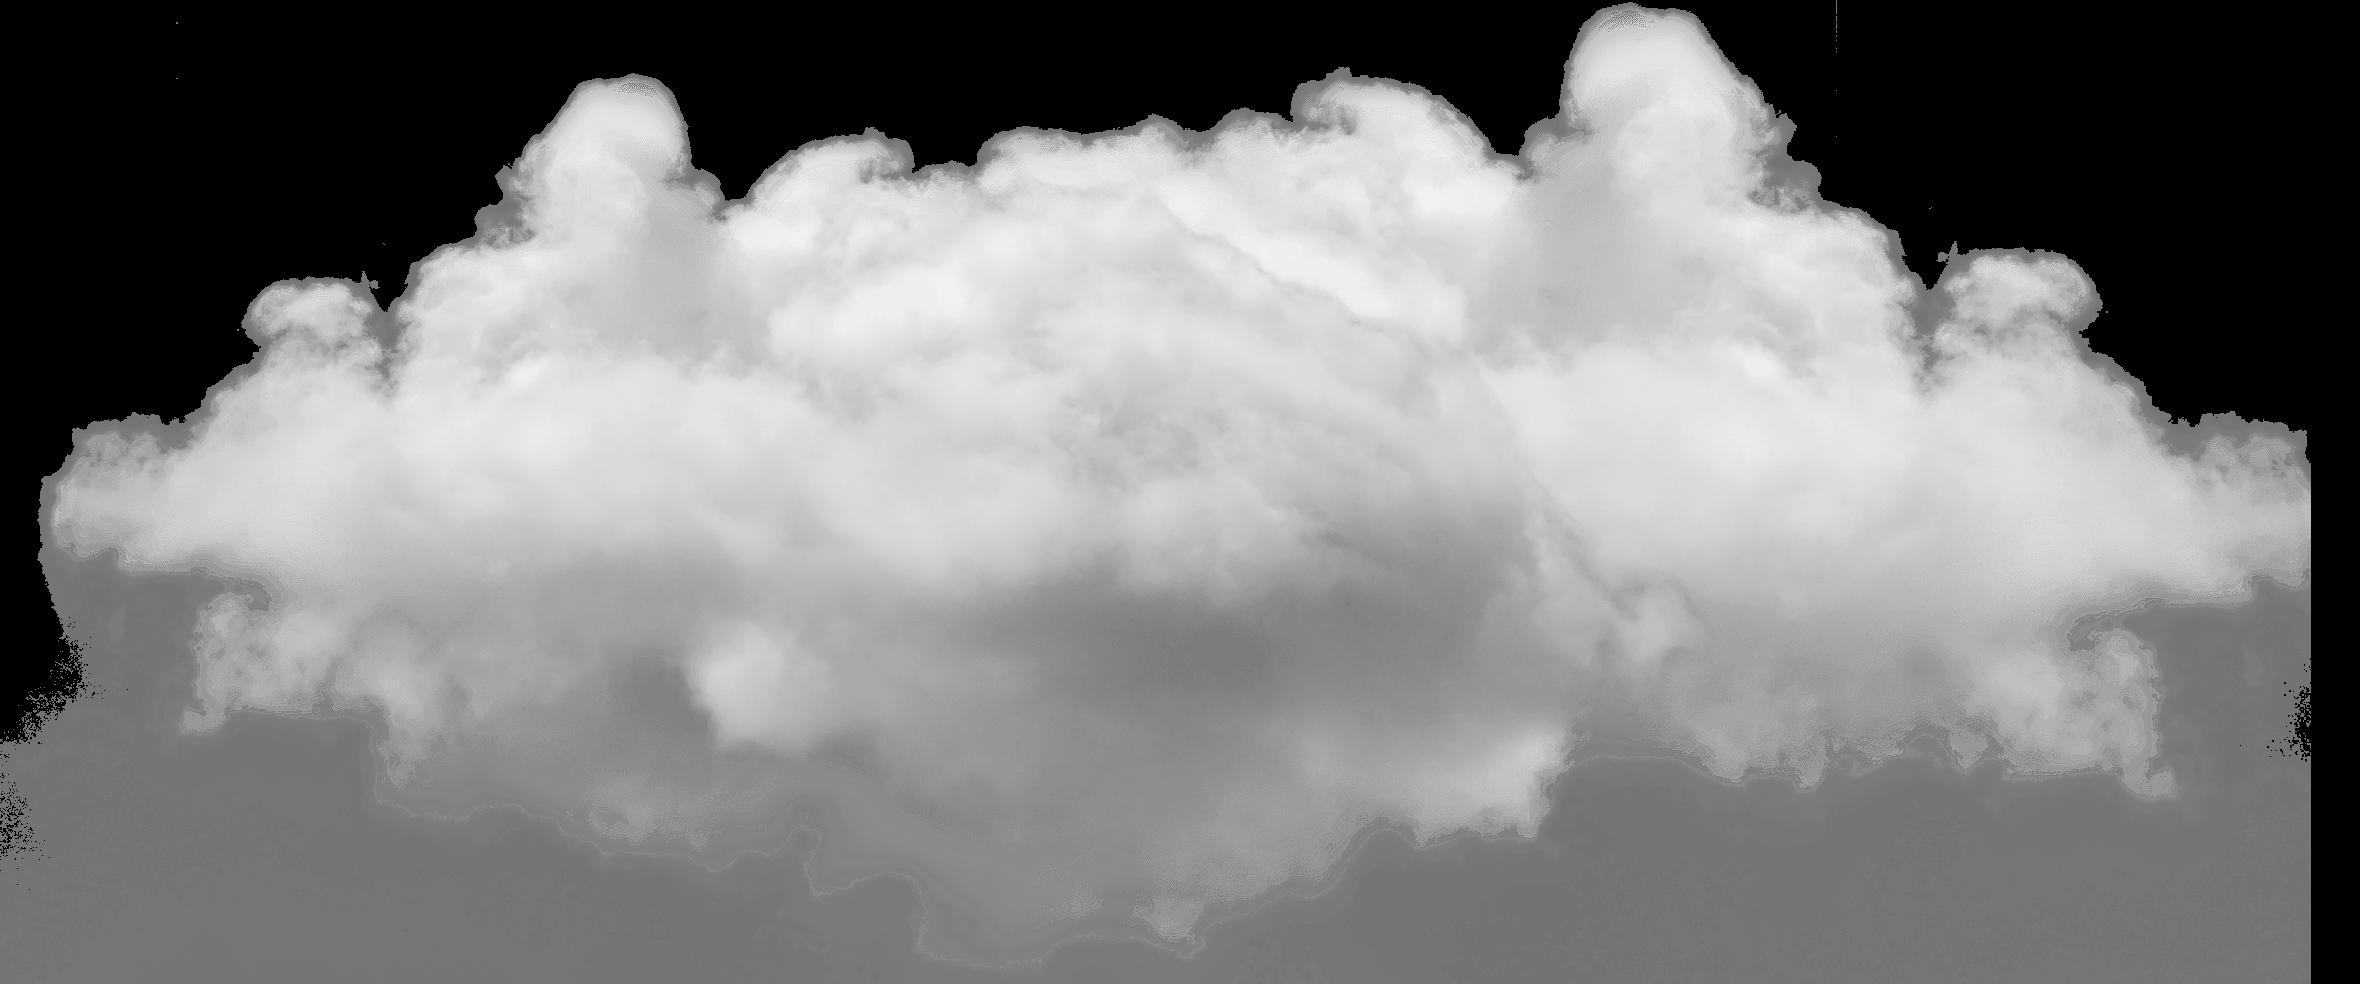 Clouds clipart cumulus cloud. Small single transparent png